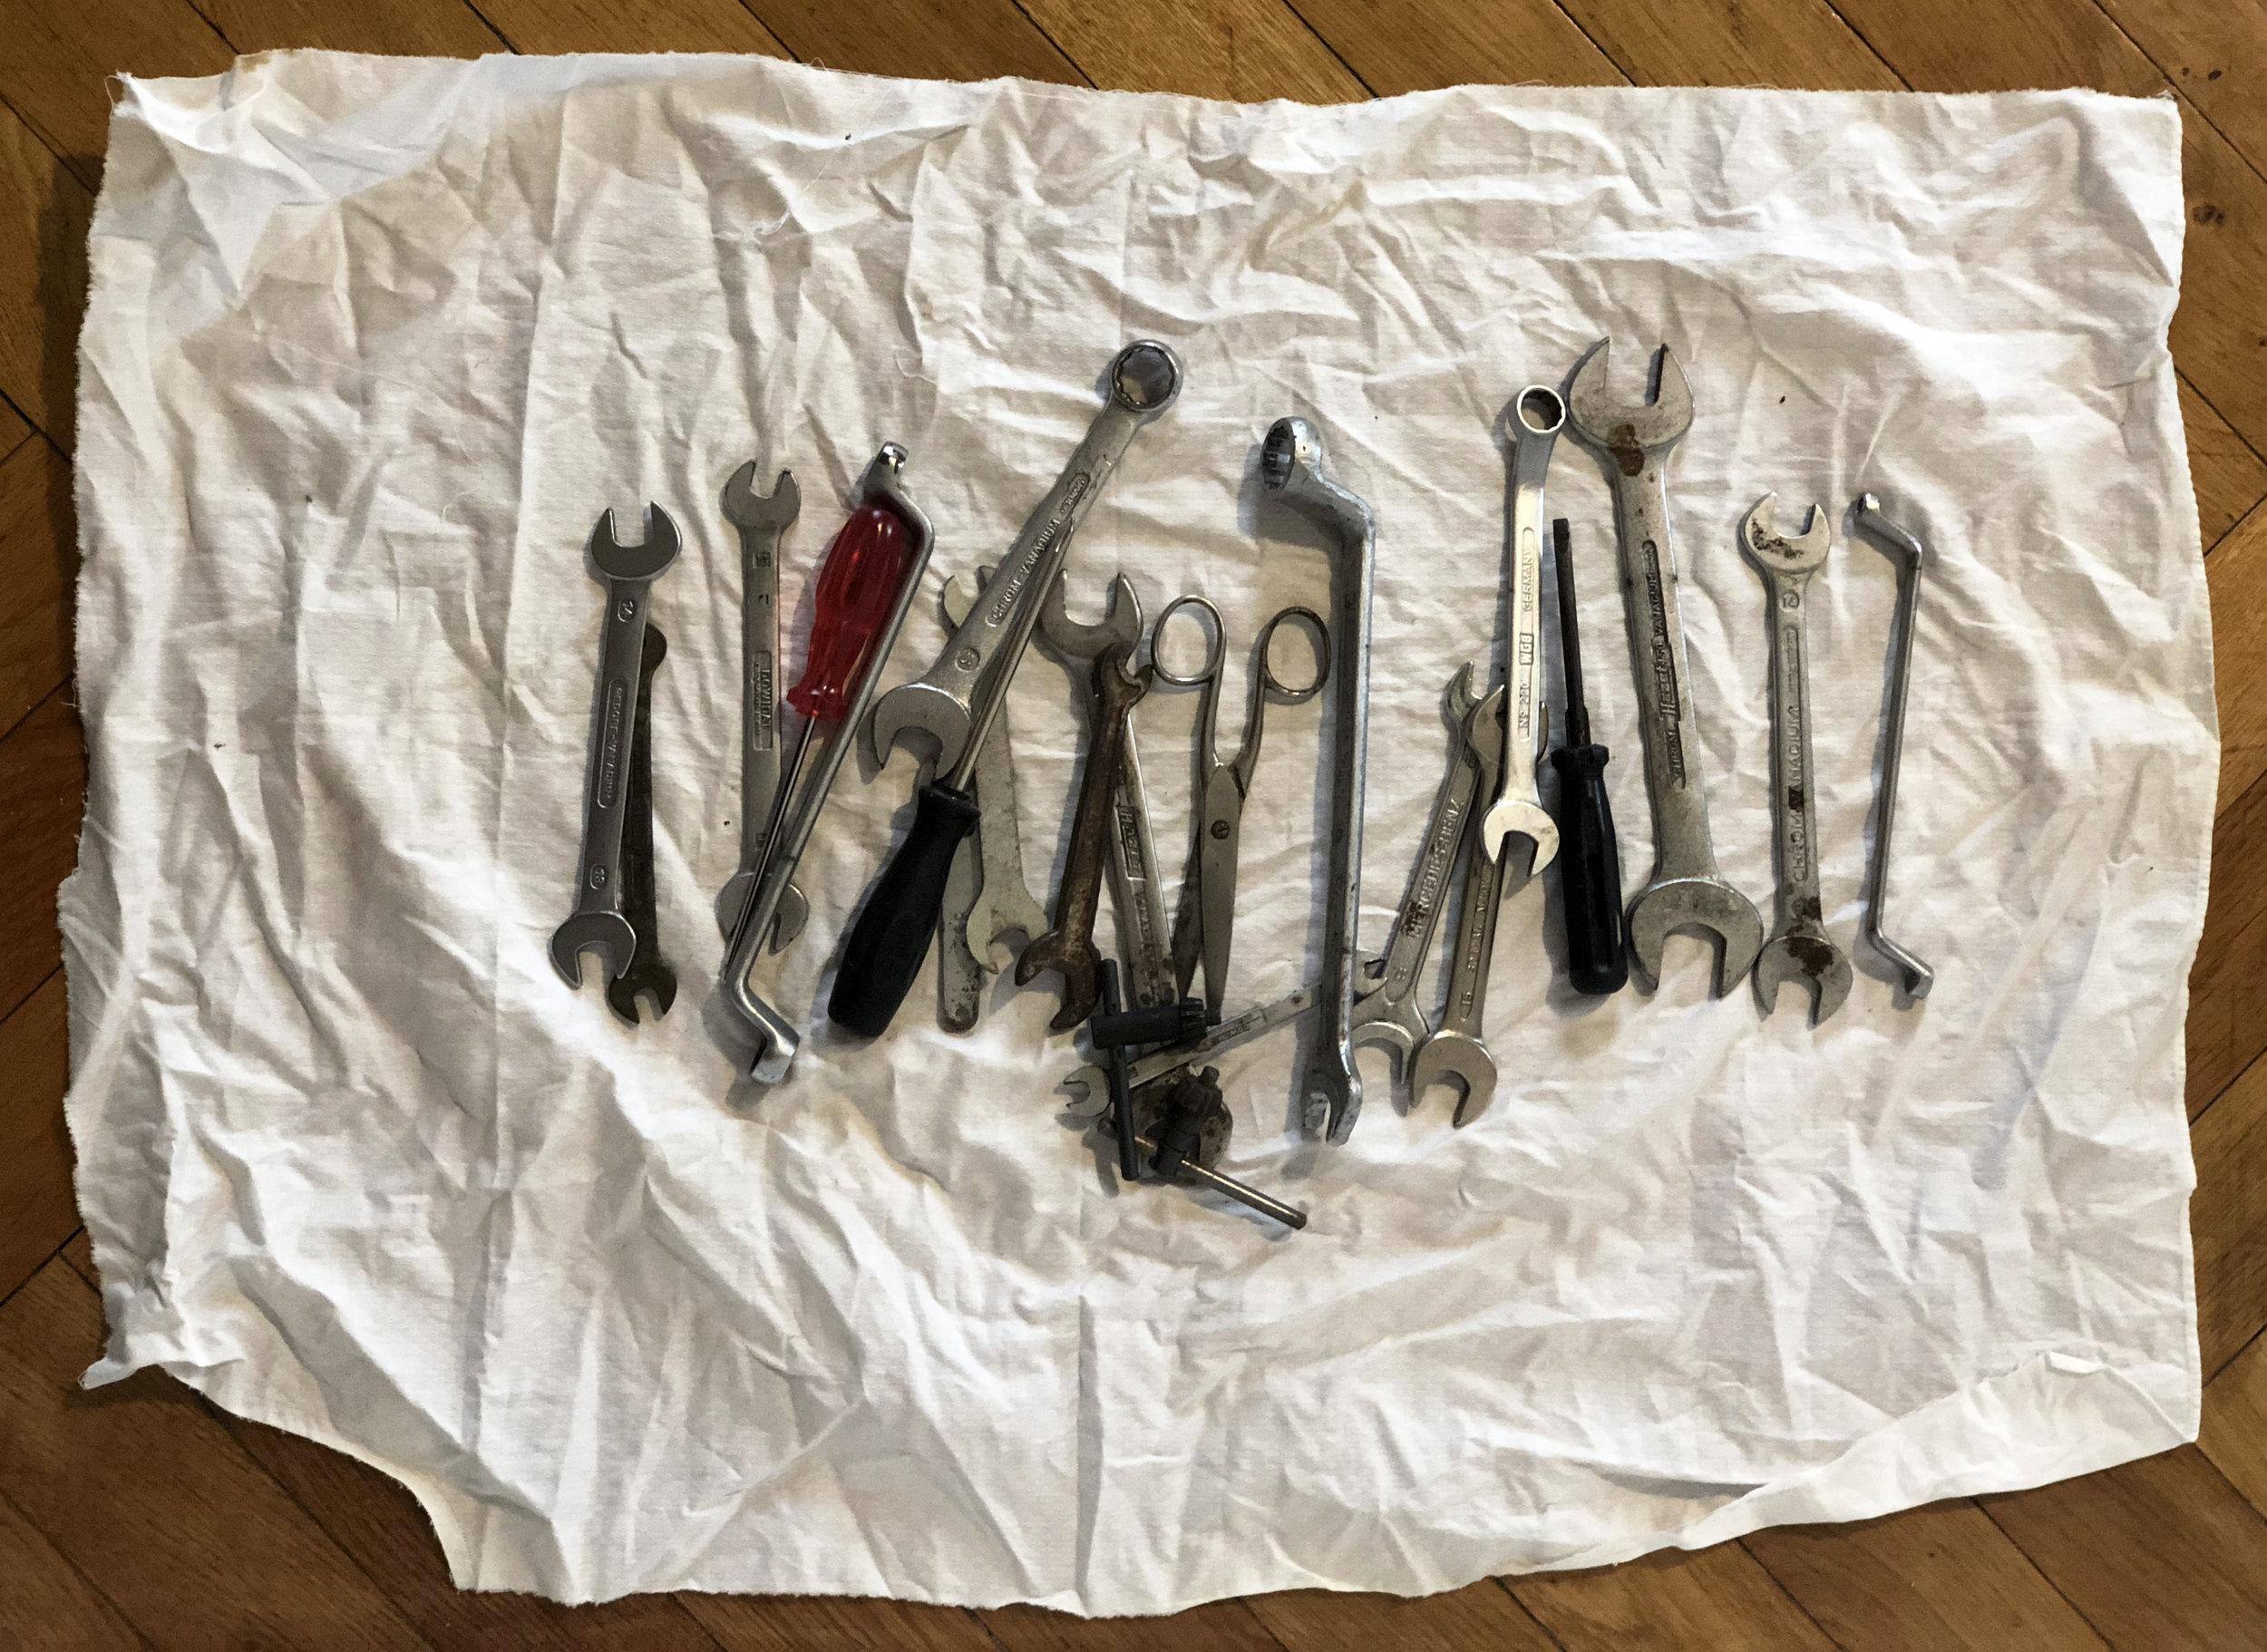 Constantin Thun,  Untitled toolbox (Axel) , 2019 Cloth, assorted tools 76 x 54 x 3 cm